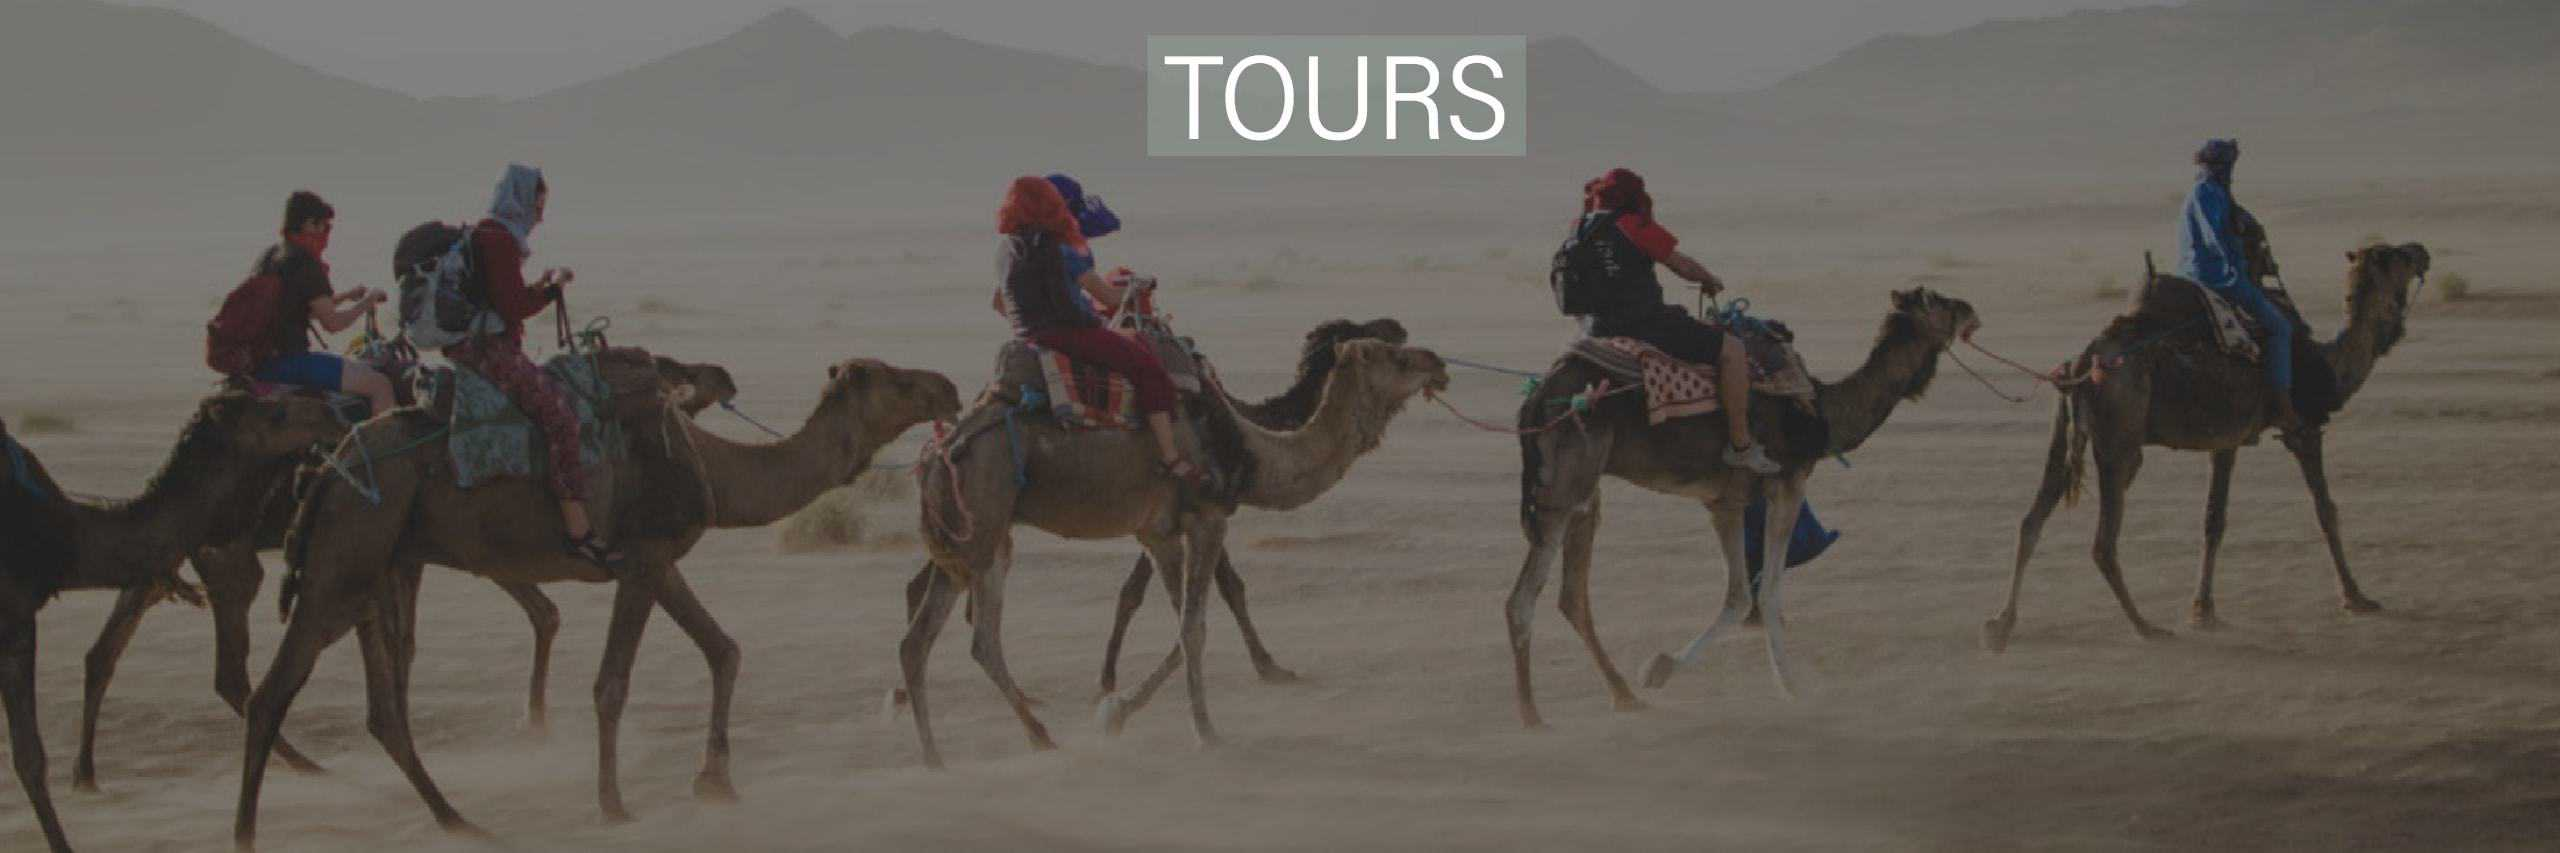 Tour Sites